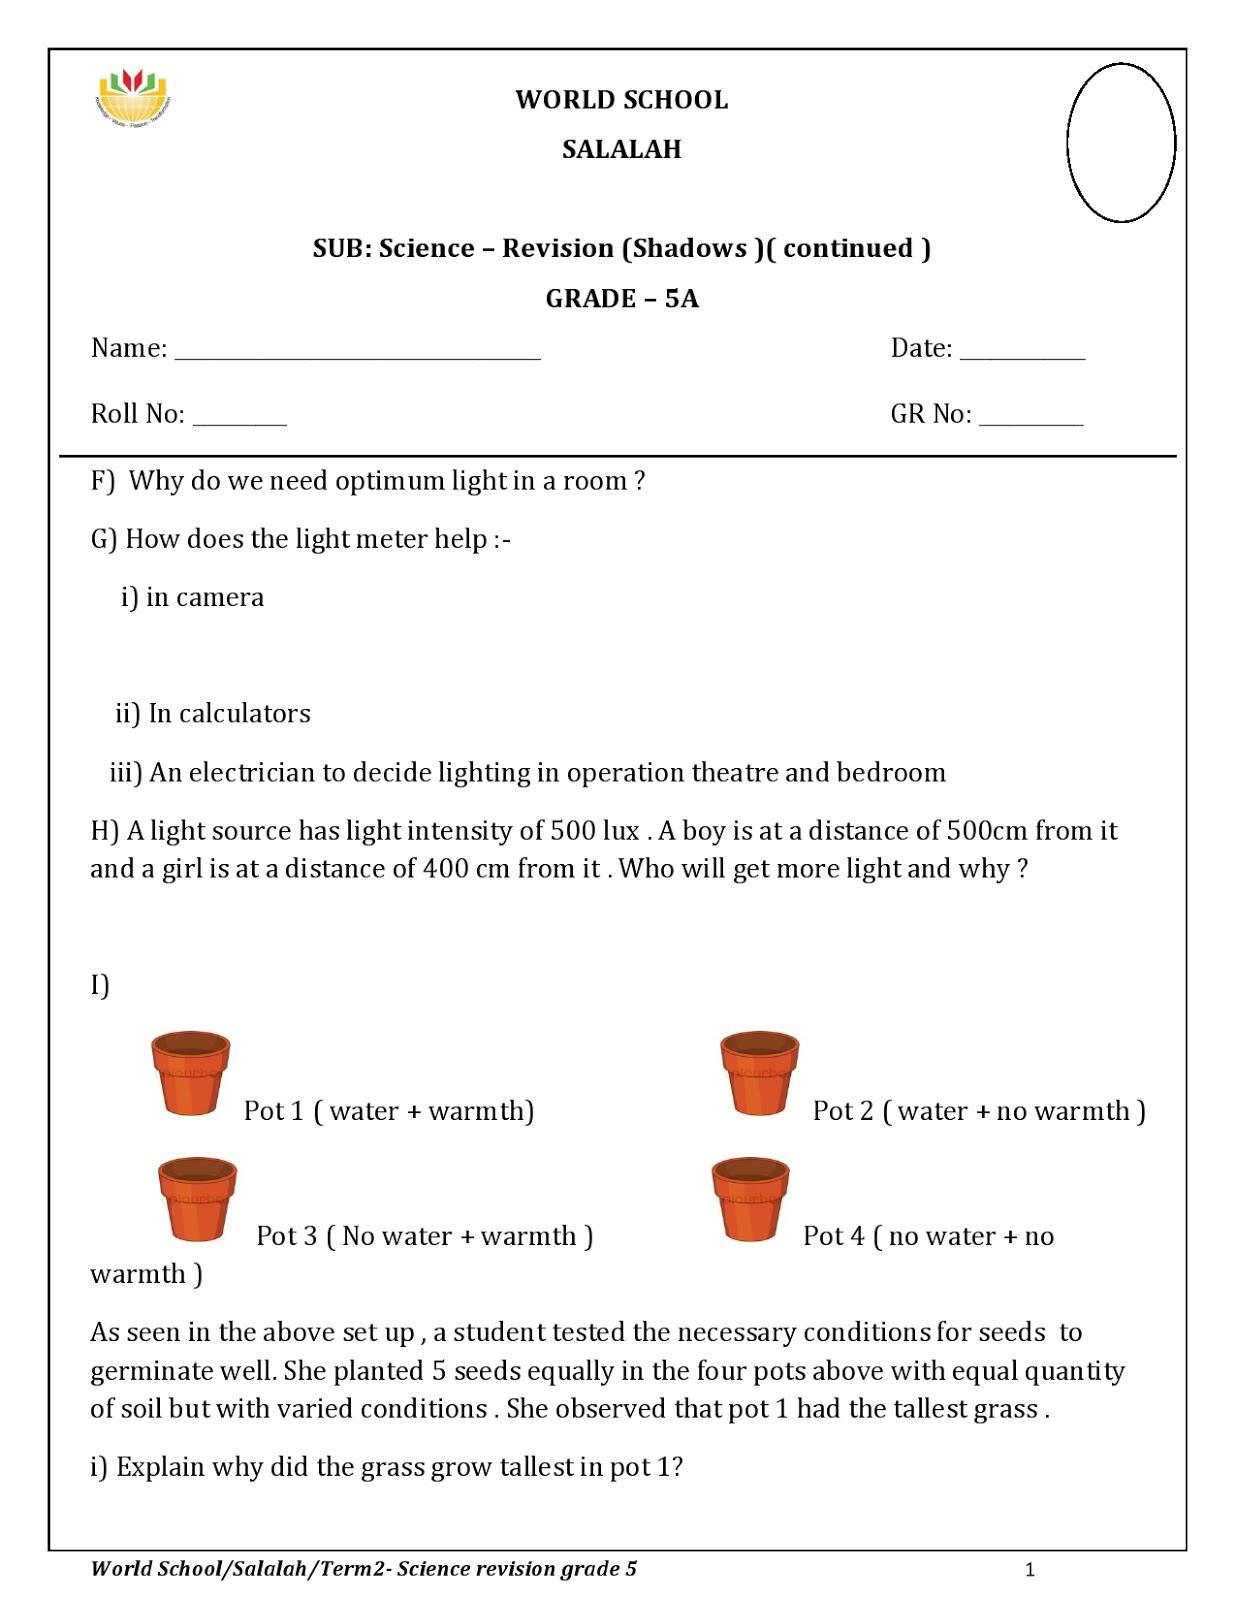 hight resolution of WORLD SCHOOL OMAN: Homework for Grade 5 as on 16/05/2018